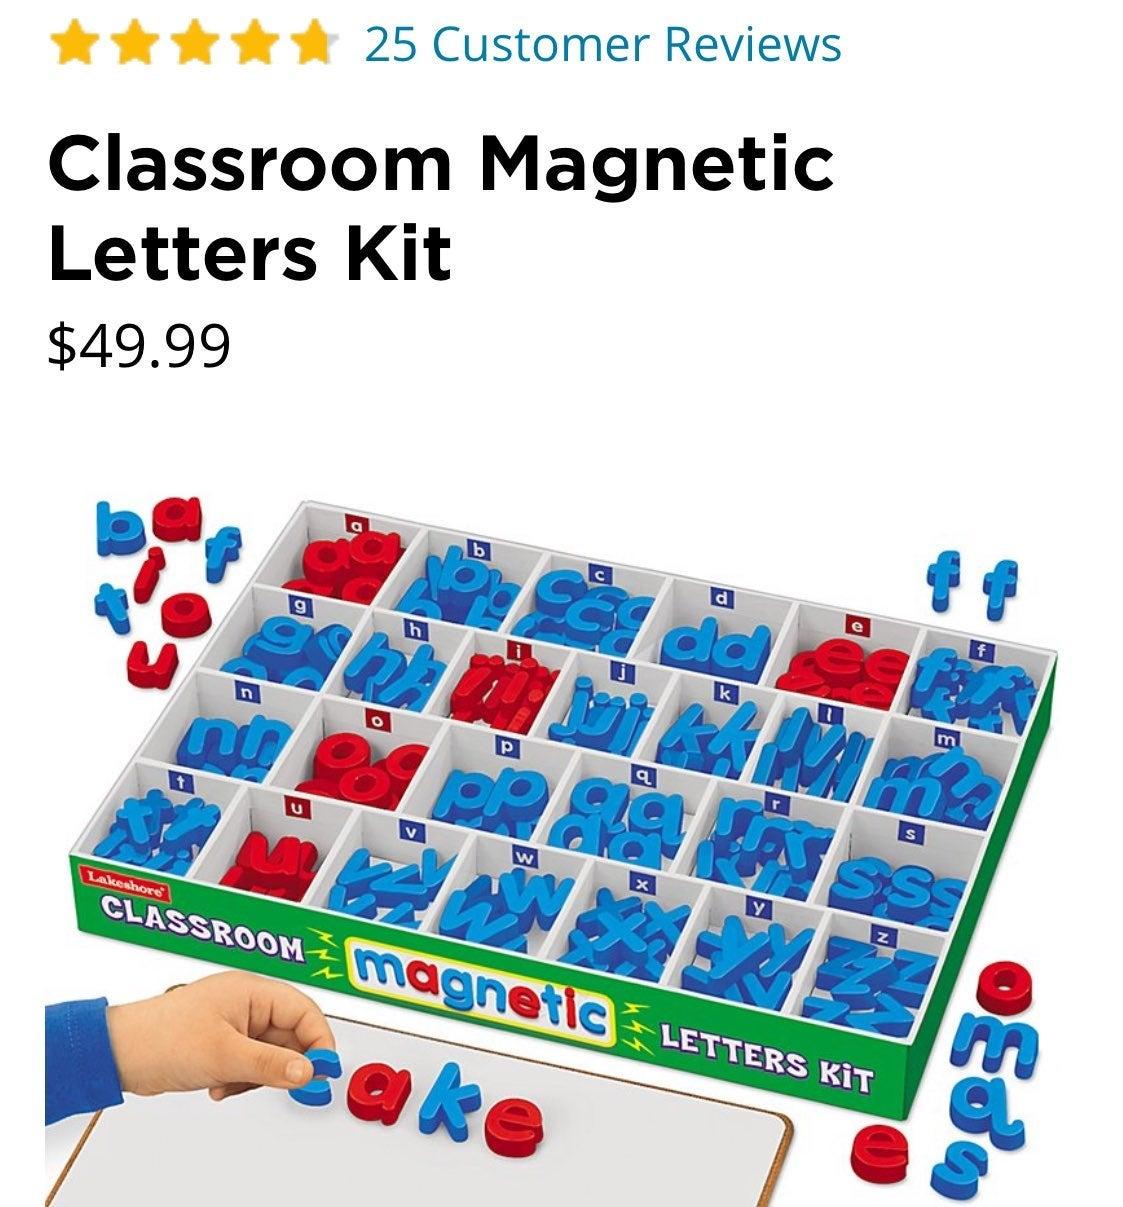 Lakeshore Magnetic Letters set